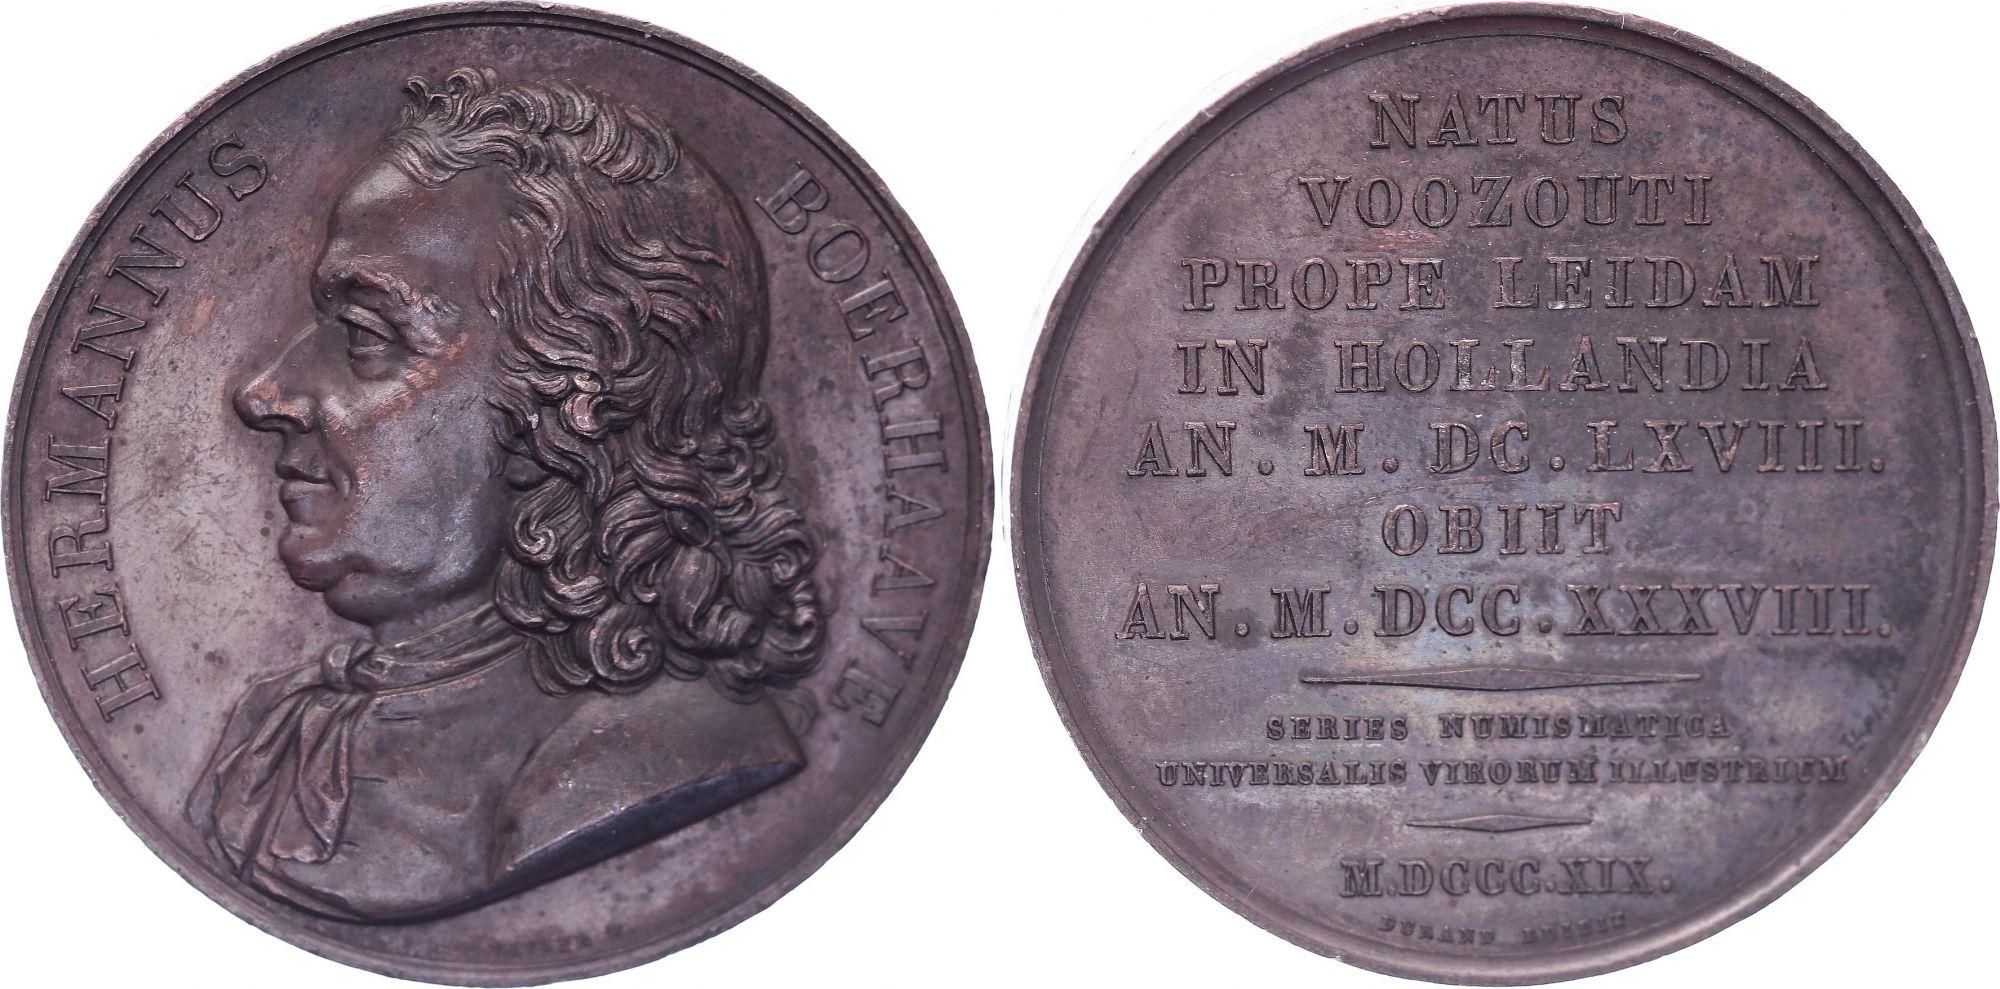 Netherlands Herman Boerhaave (1668-1738) - 1819 by Pierre Amédée Durand